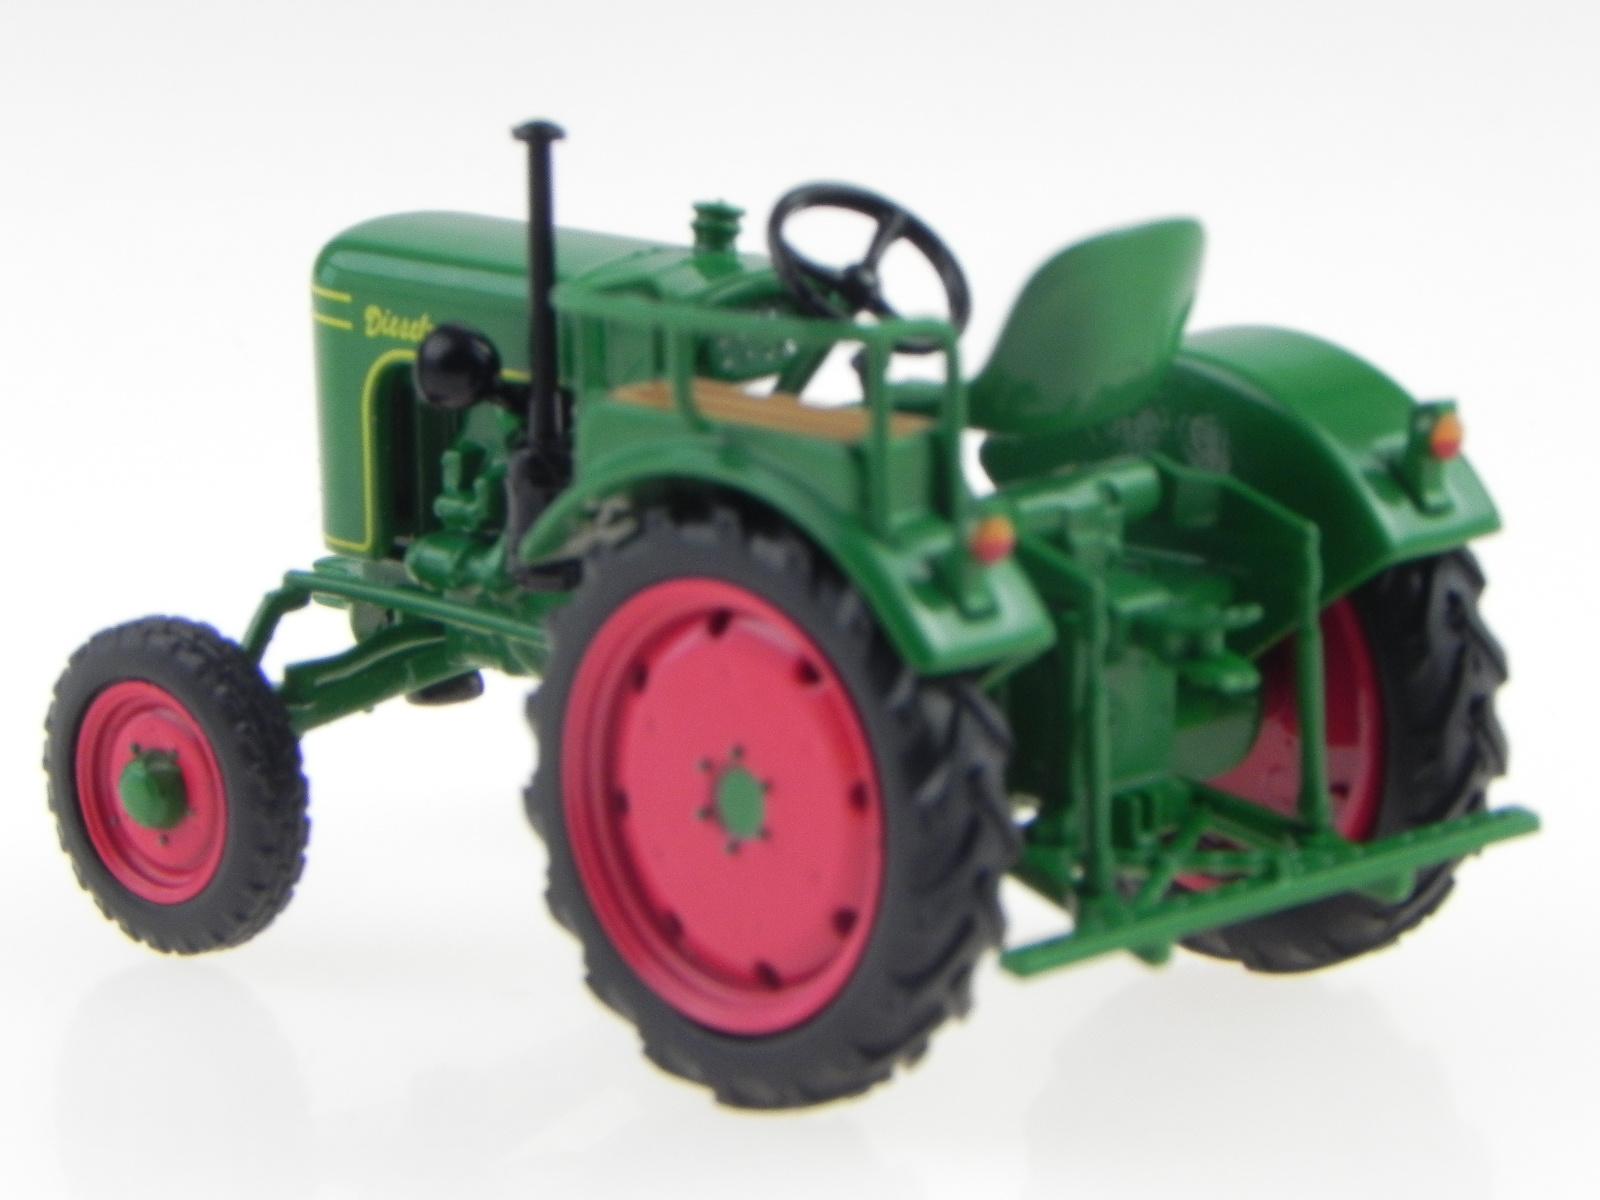 Fendt F15 H6 Dieselross Tractor 1956 Green Red IXO 1:43 TRA005G Model